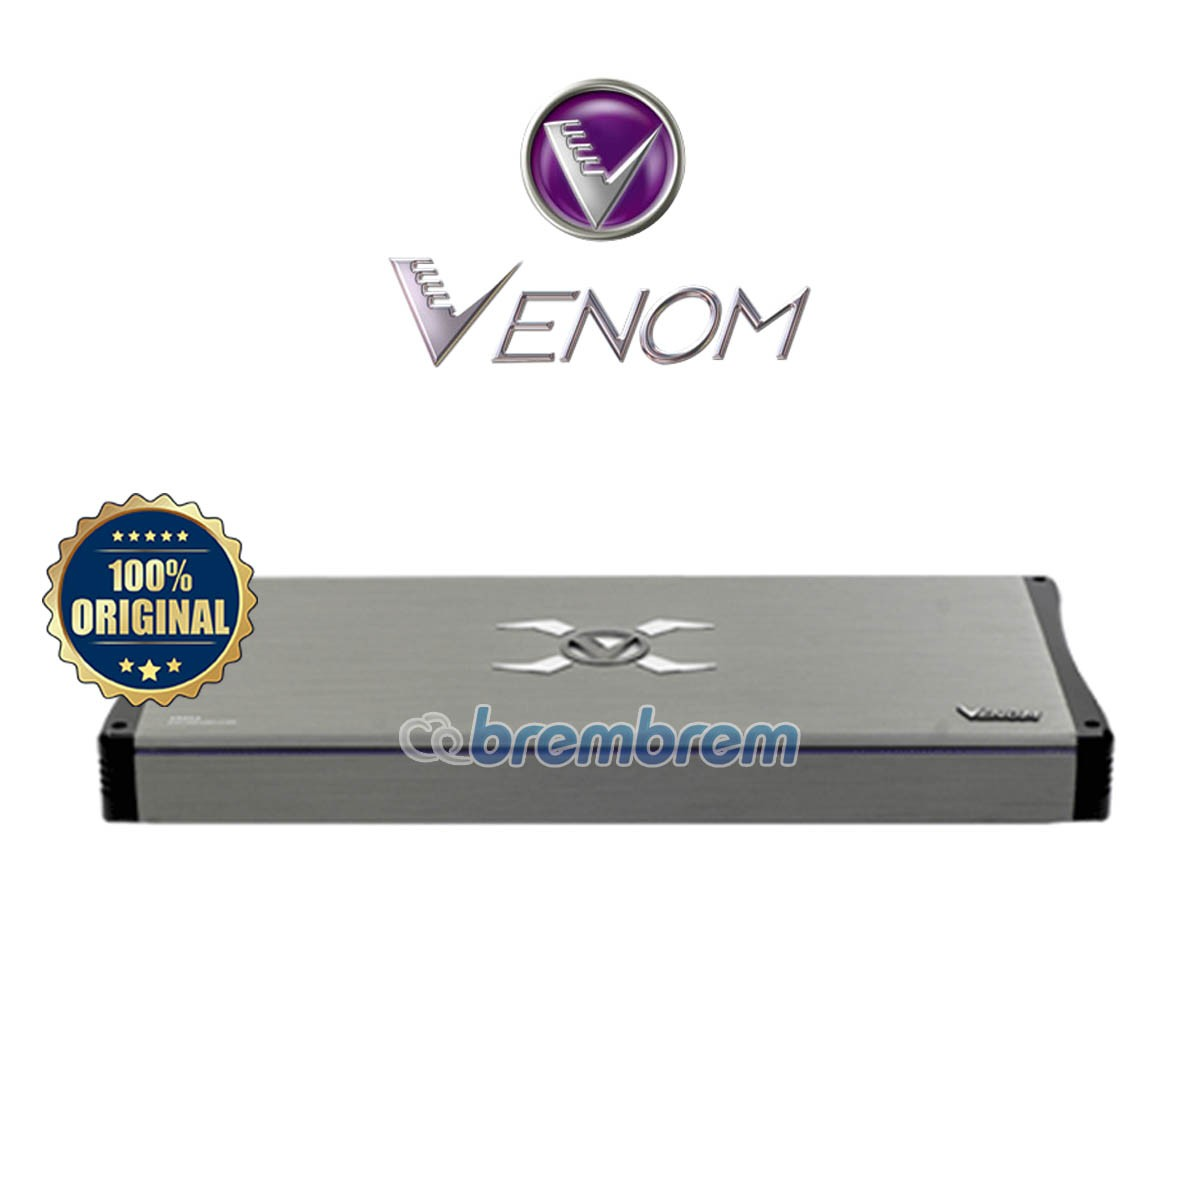 NEW VENOM X SERIES V590X - POWER 5 CHANNEL